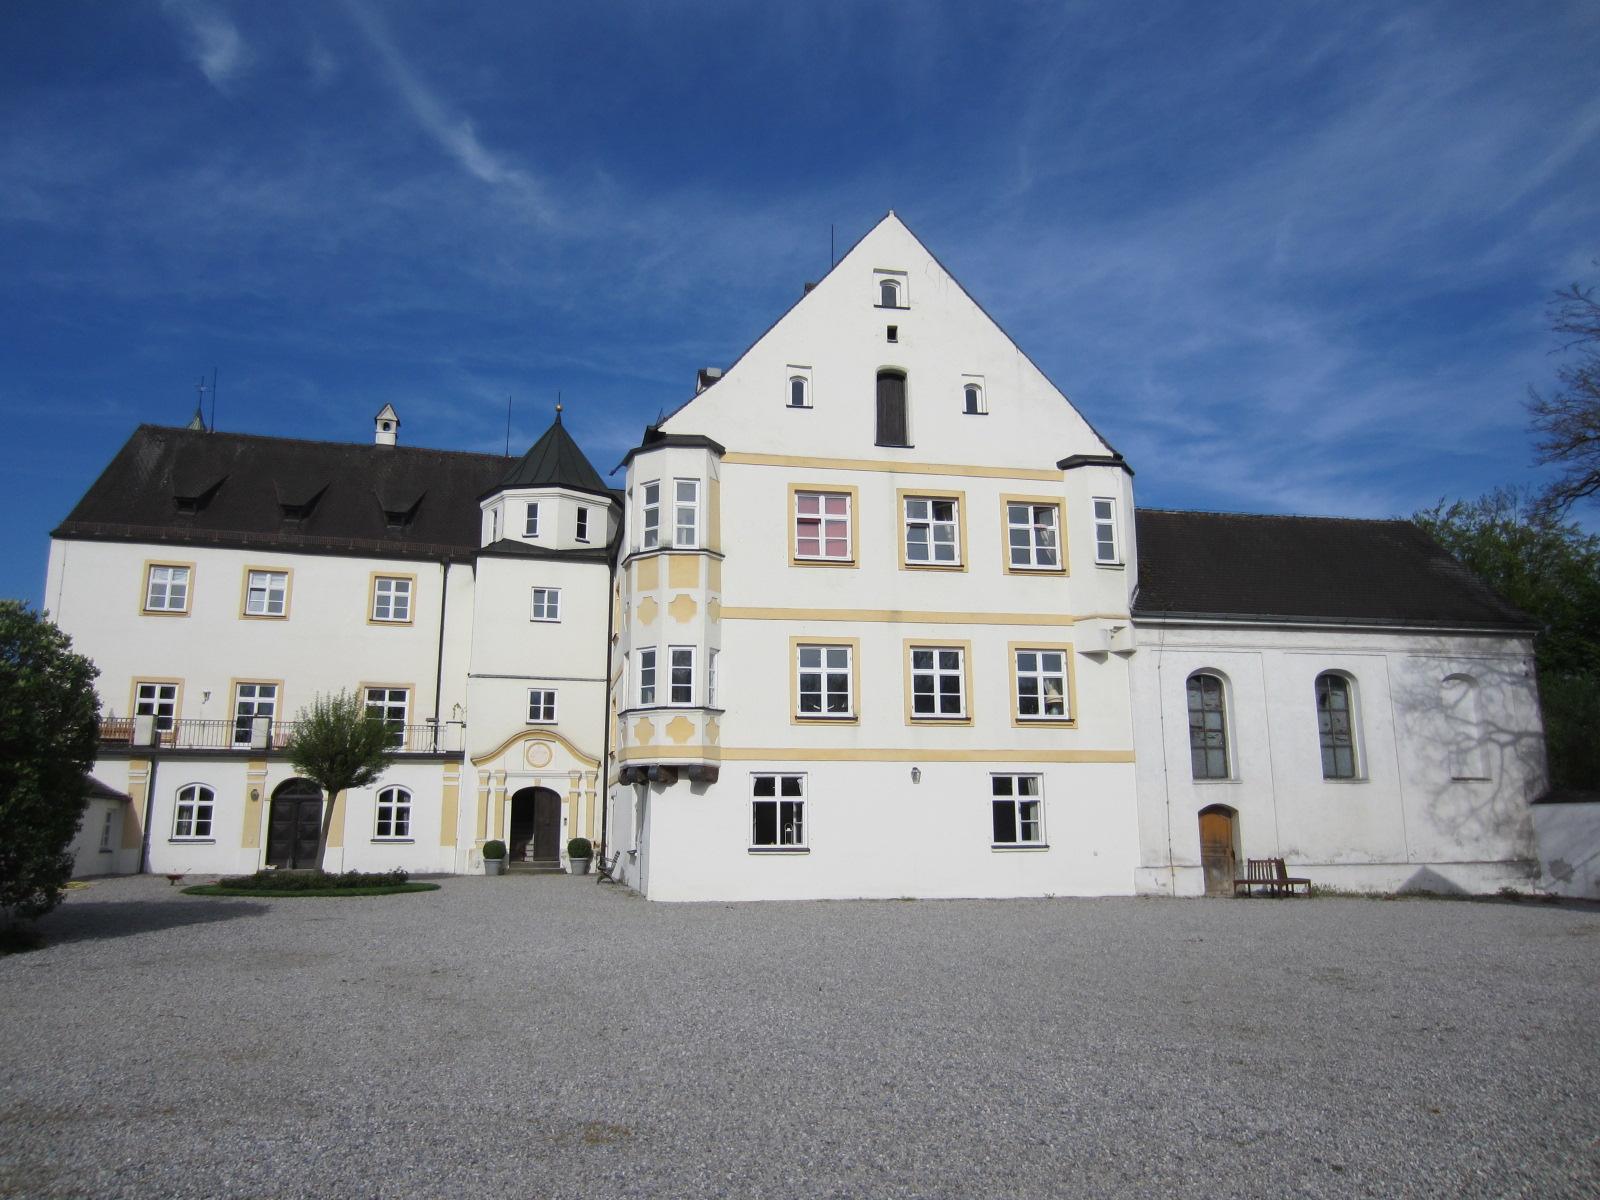 regenerative Energien - Biomasse-HW Schloss Lauterbach - Energieberatung Schloss Lauterbach